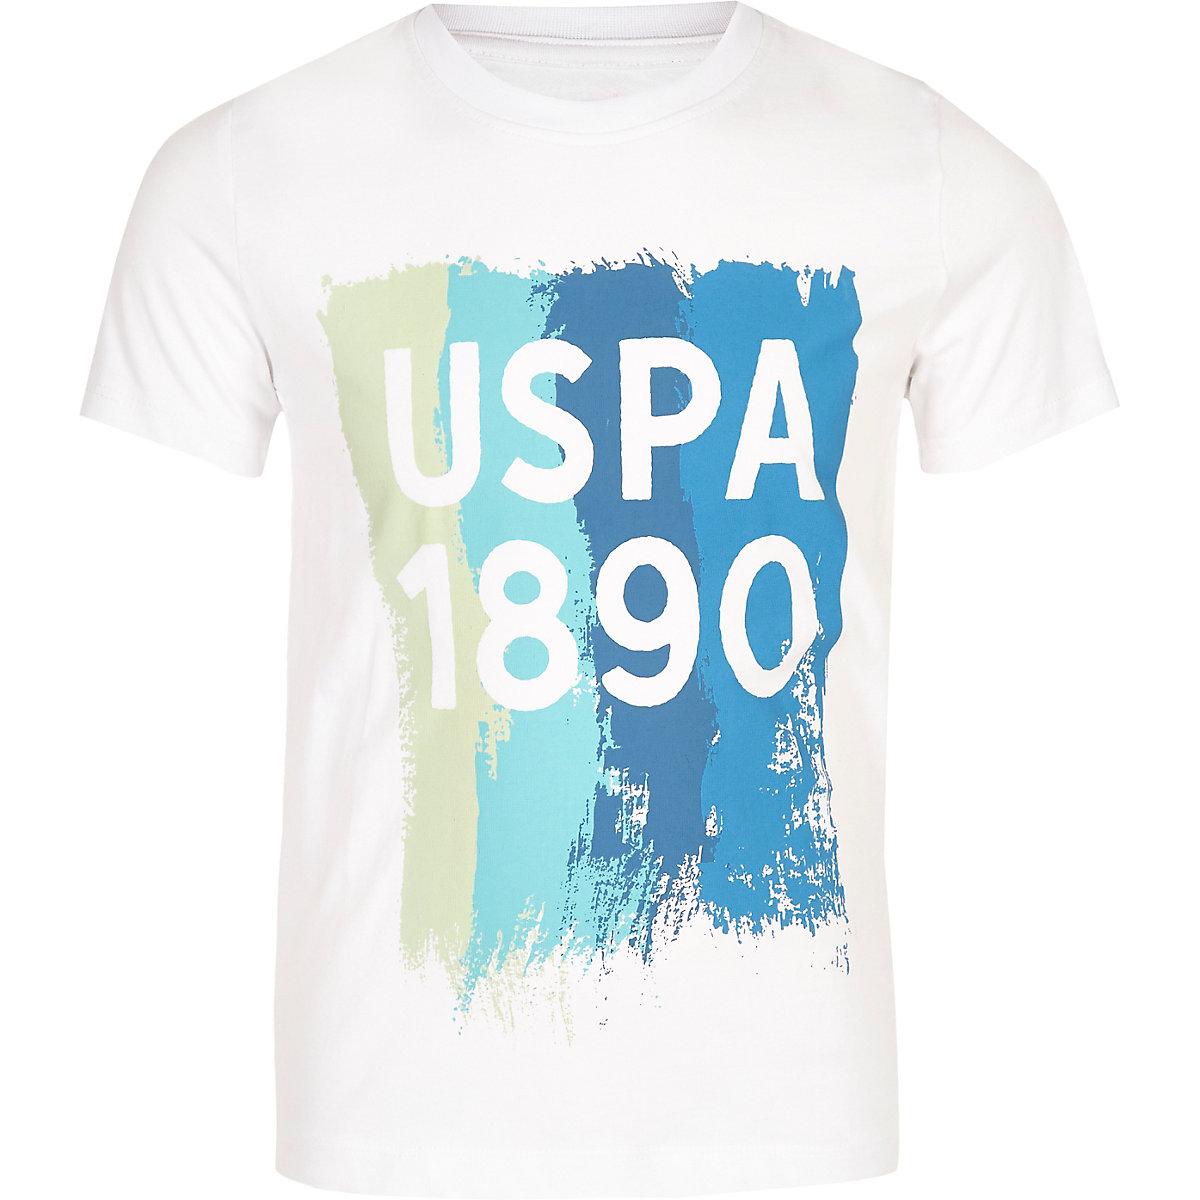 Boys white U.S. Polo Assn. 1890 T-shirt